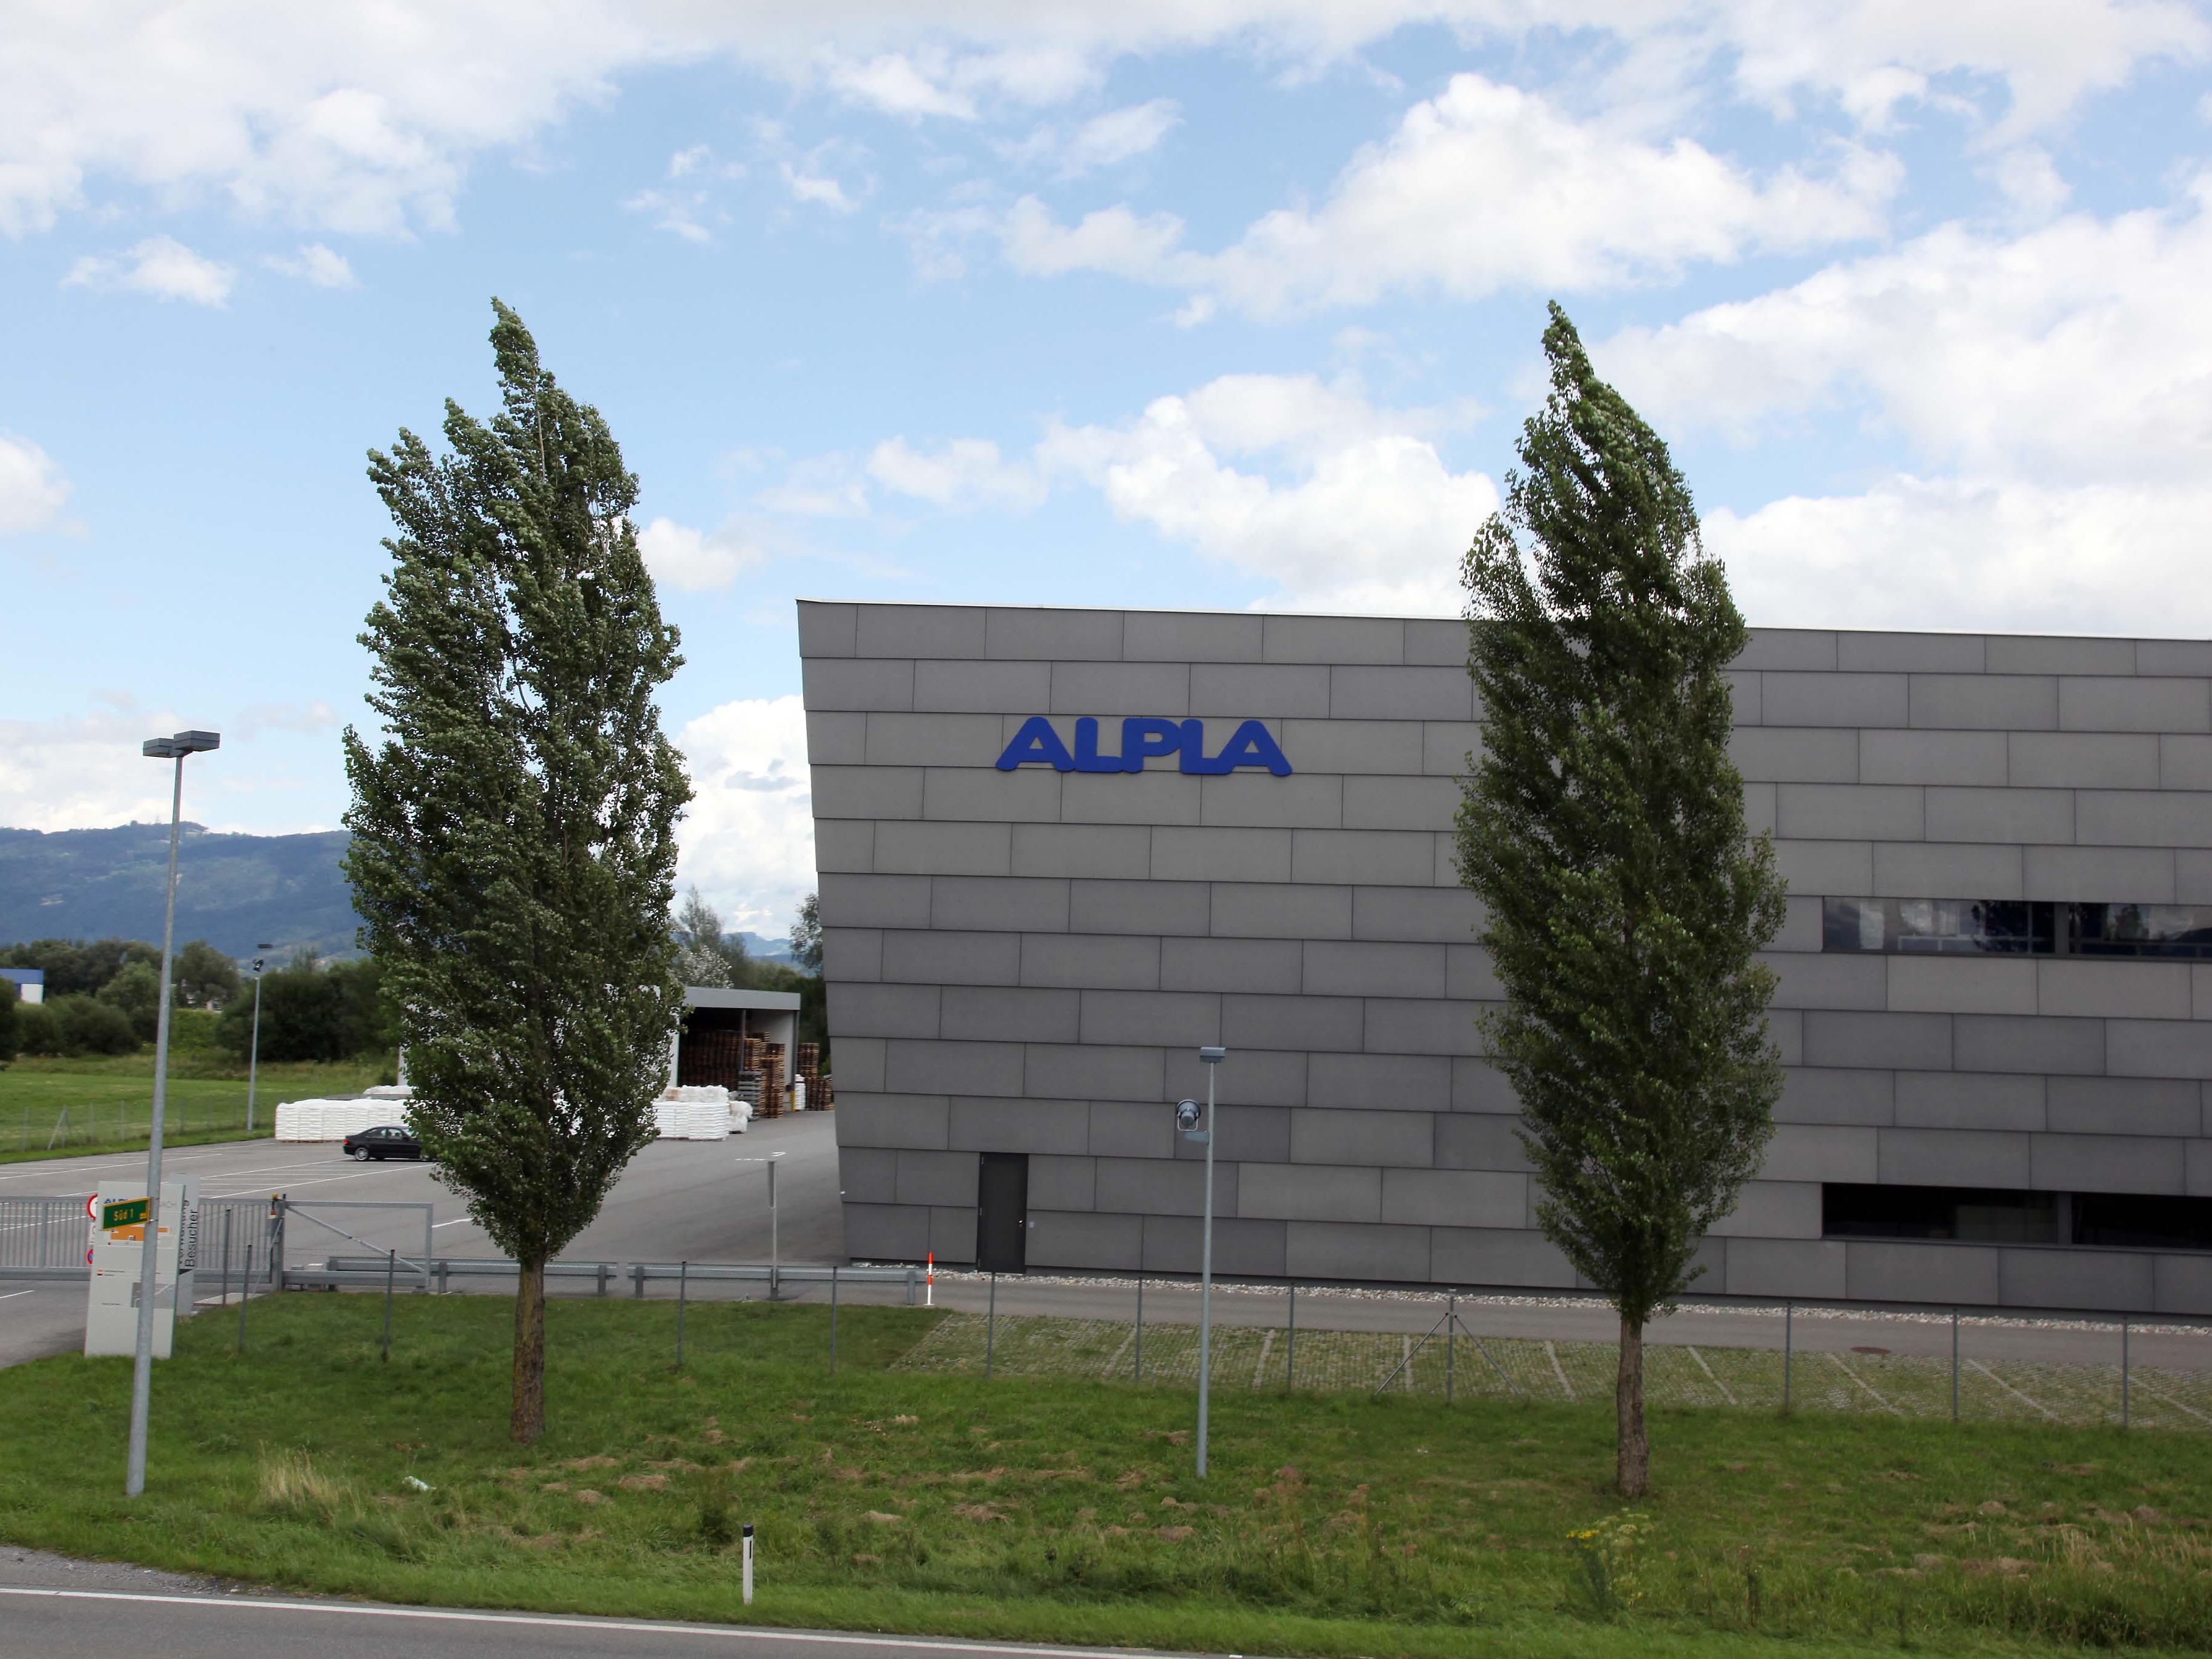 ALPLA eröffnet Standort in Ägypten.